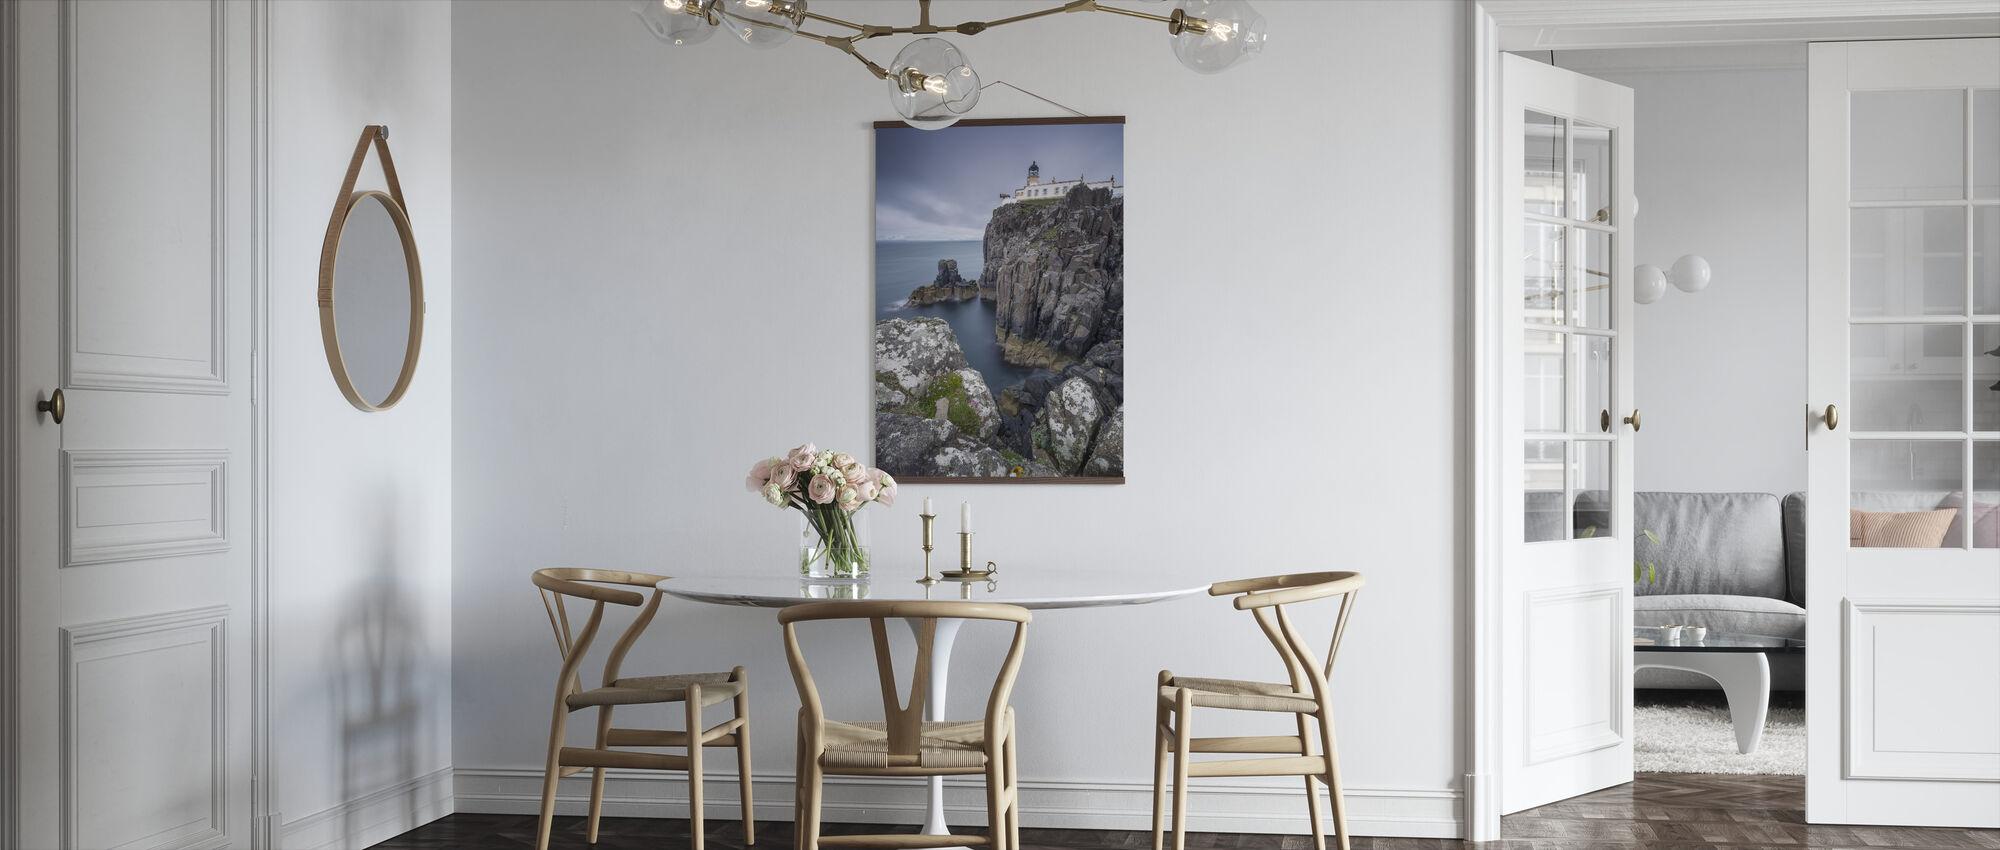 Lighthouse at Neist Point, Isle of Skye - Scotland - Poster - Kitchen